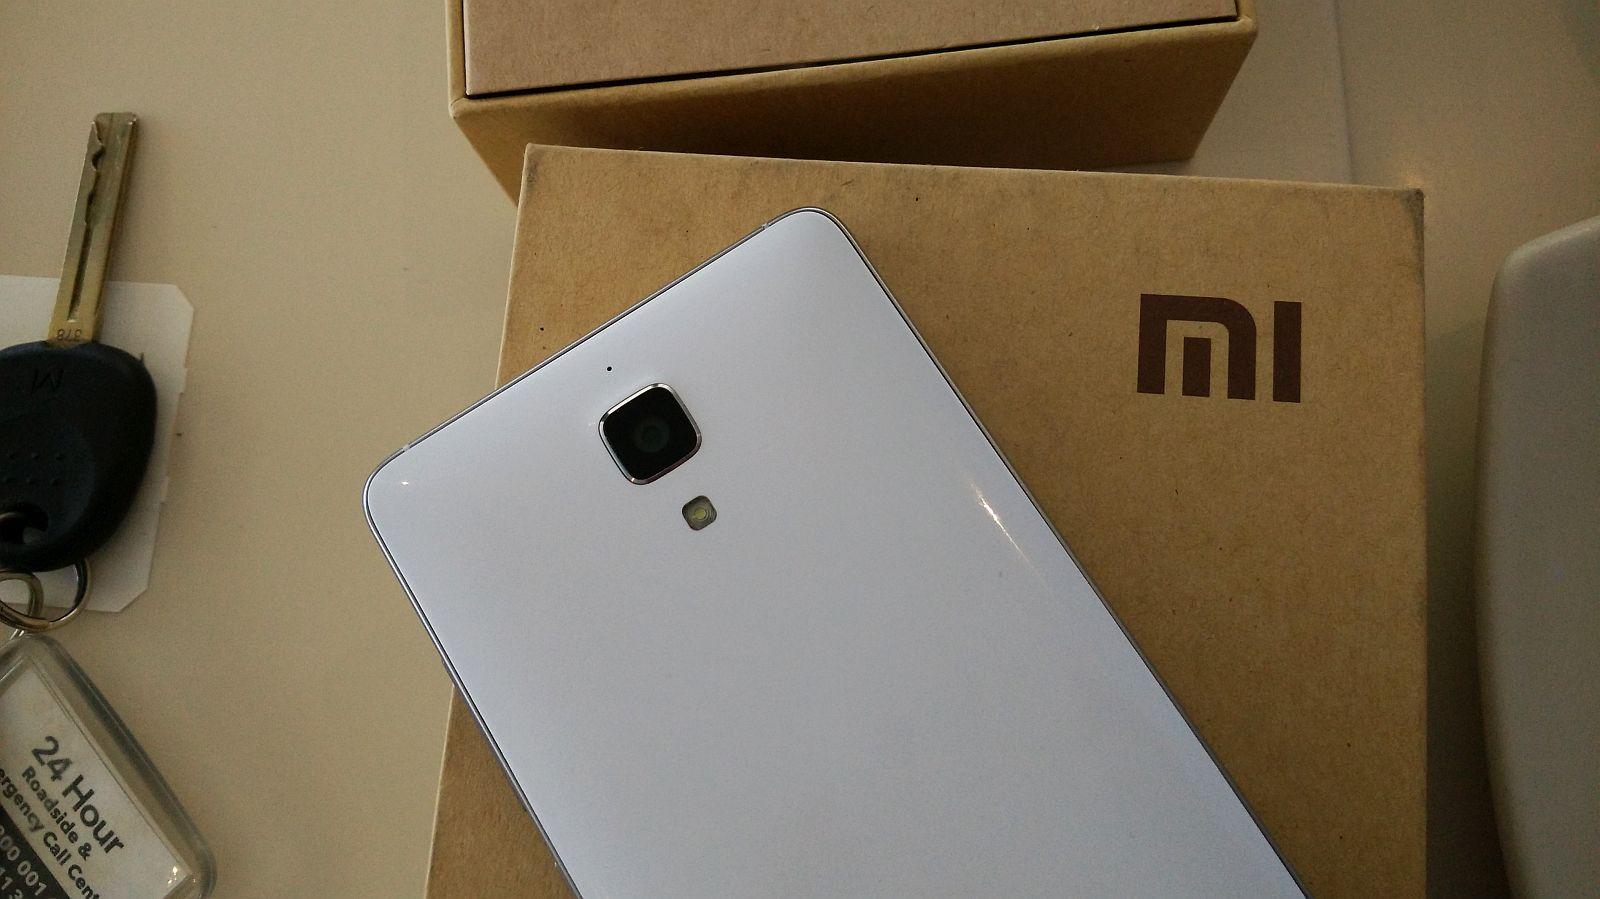 Xiaomi Mi 4 hands on 2